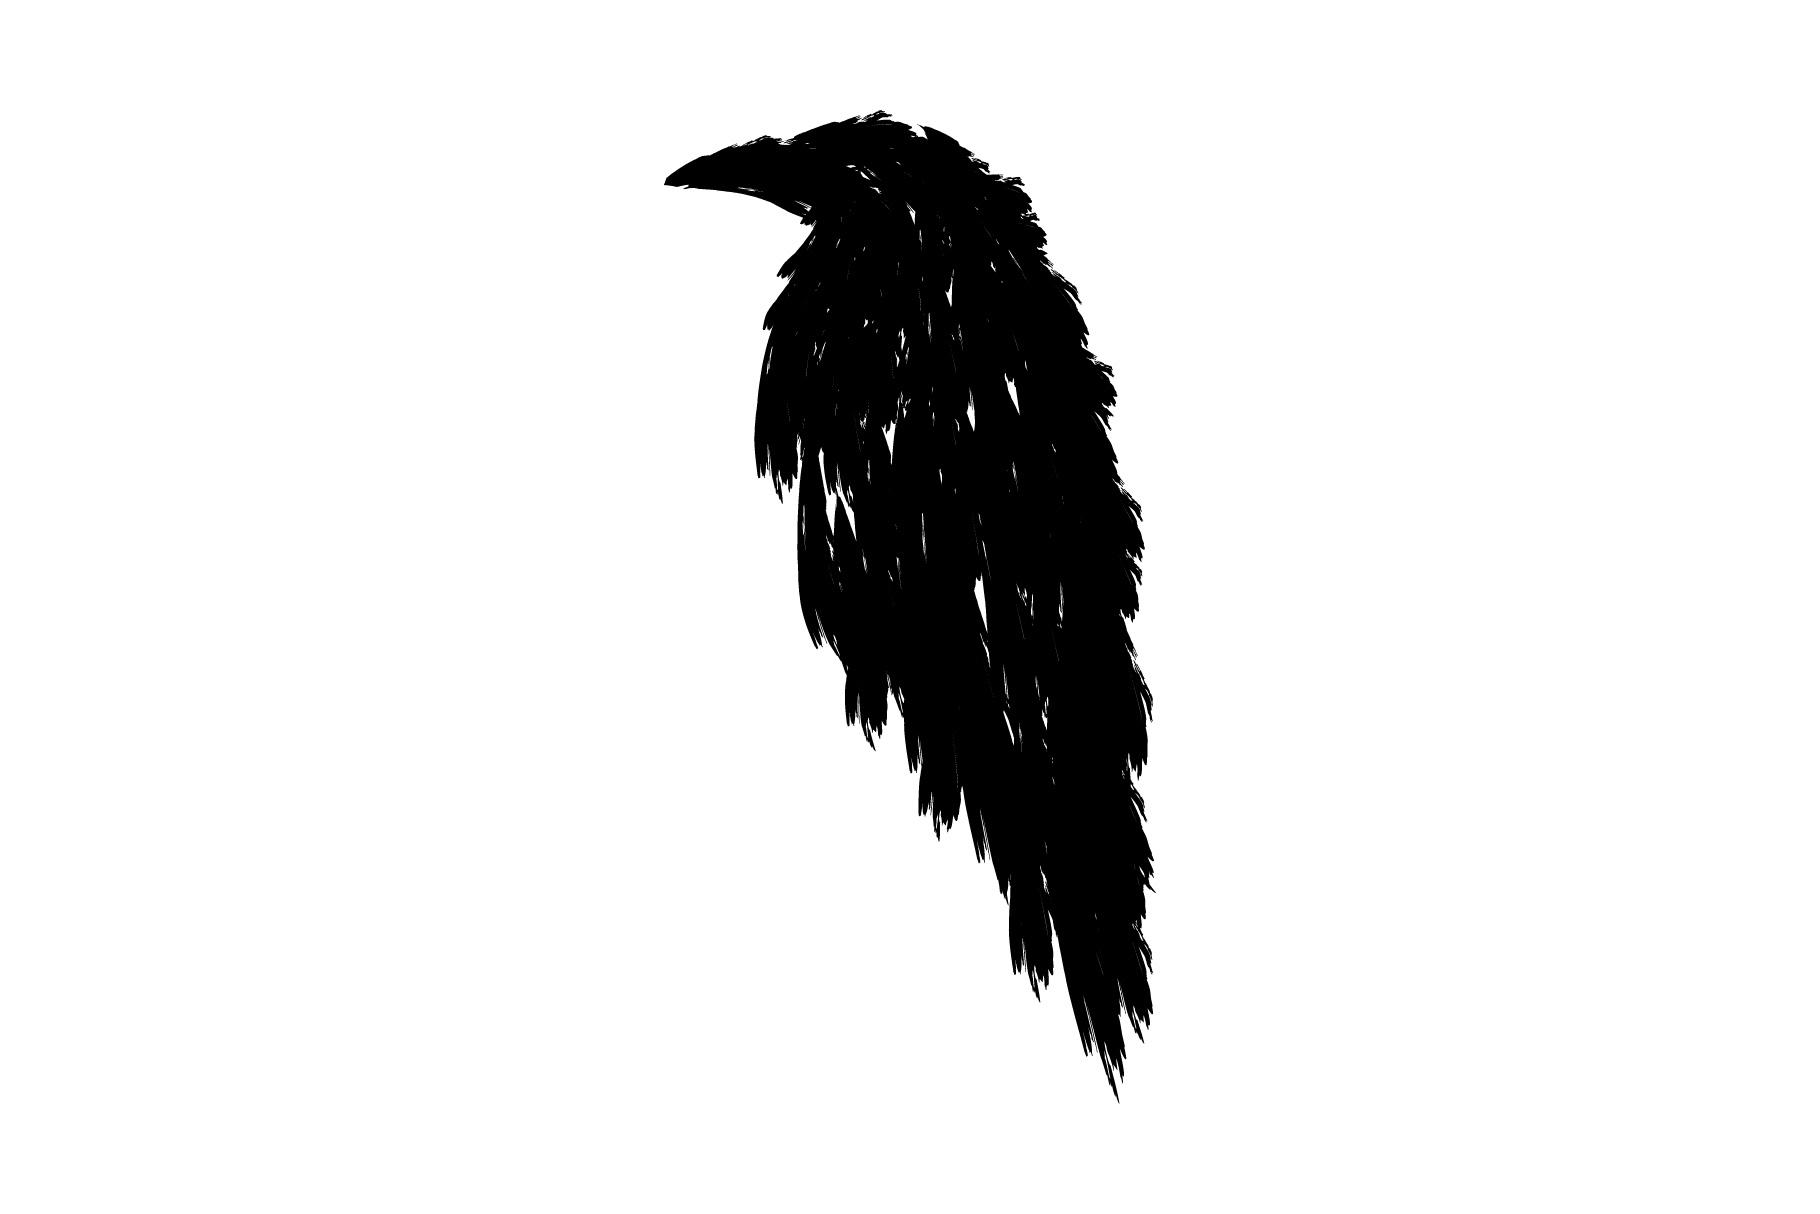 1820x1214 Black Raven Black Crow Tattoo Black Bird Hand Drawn